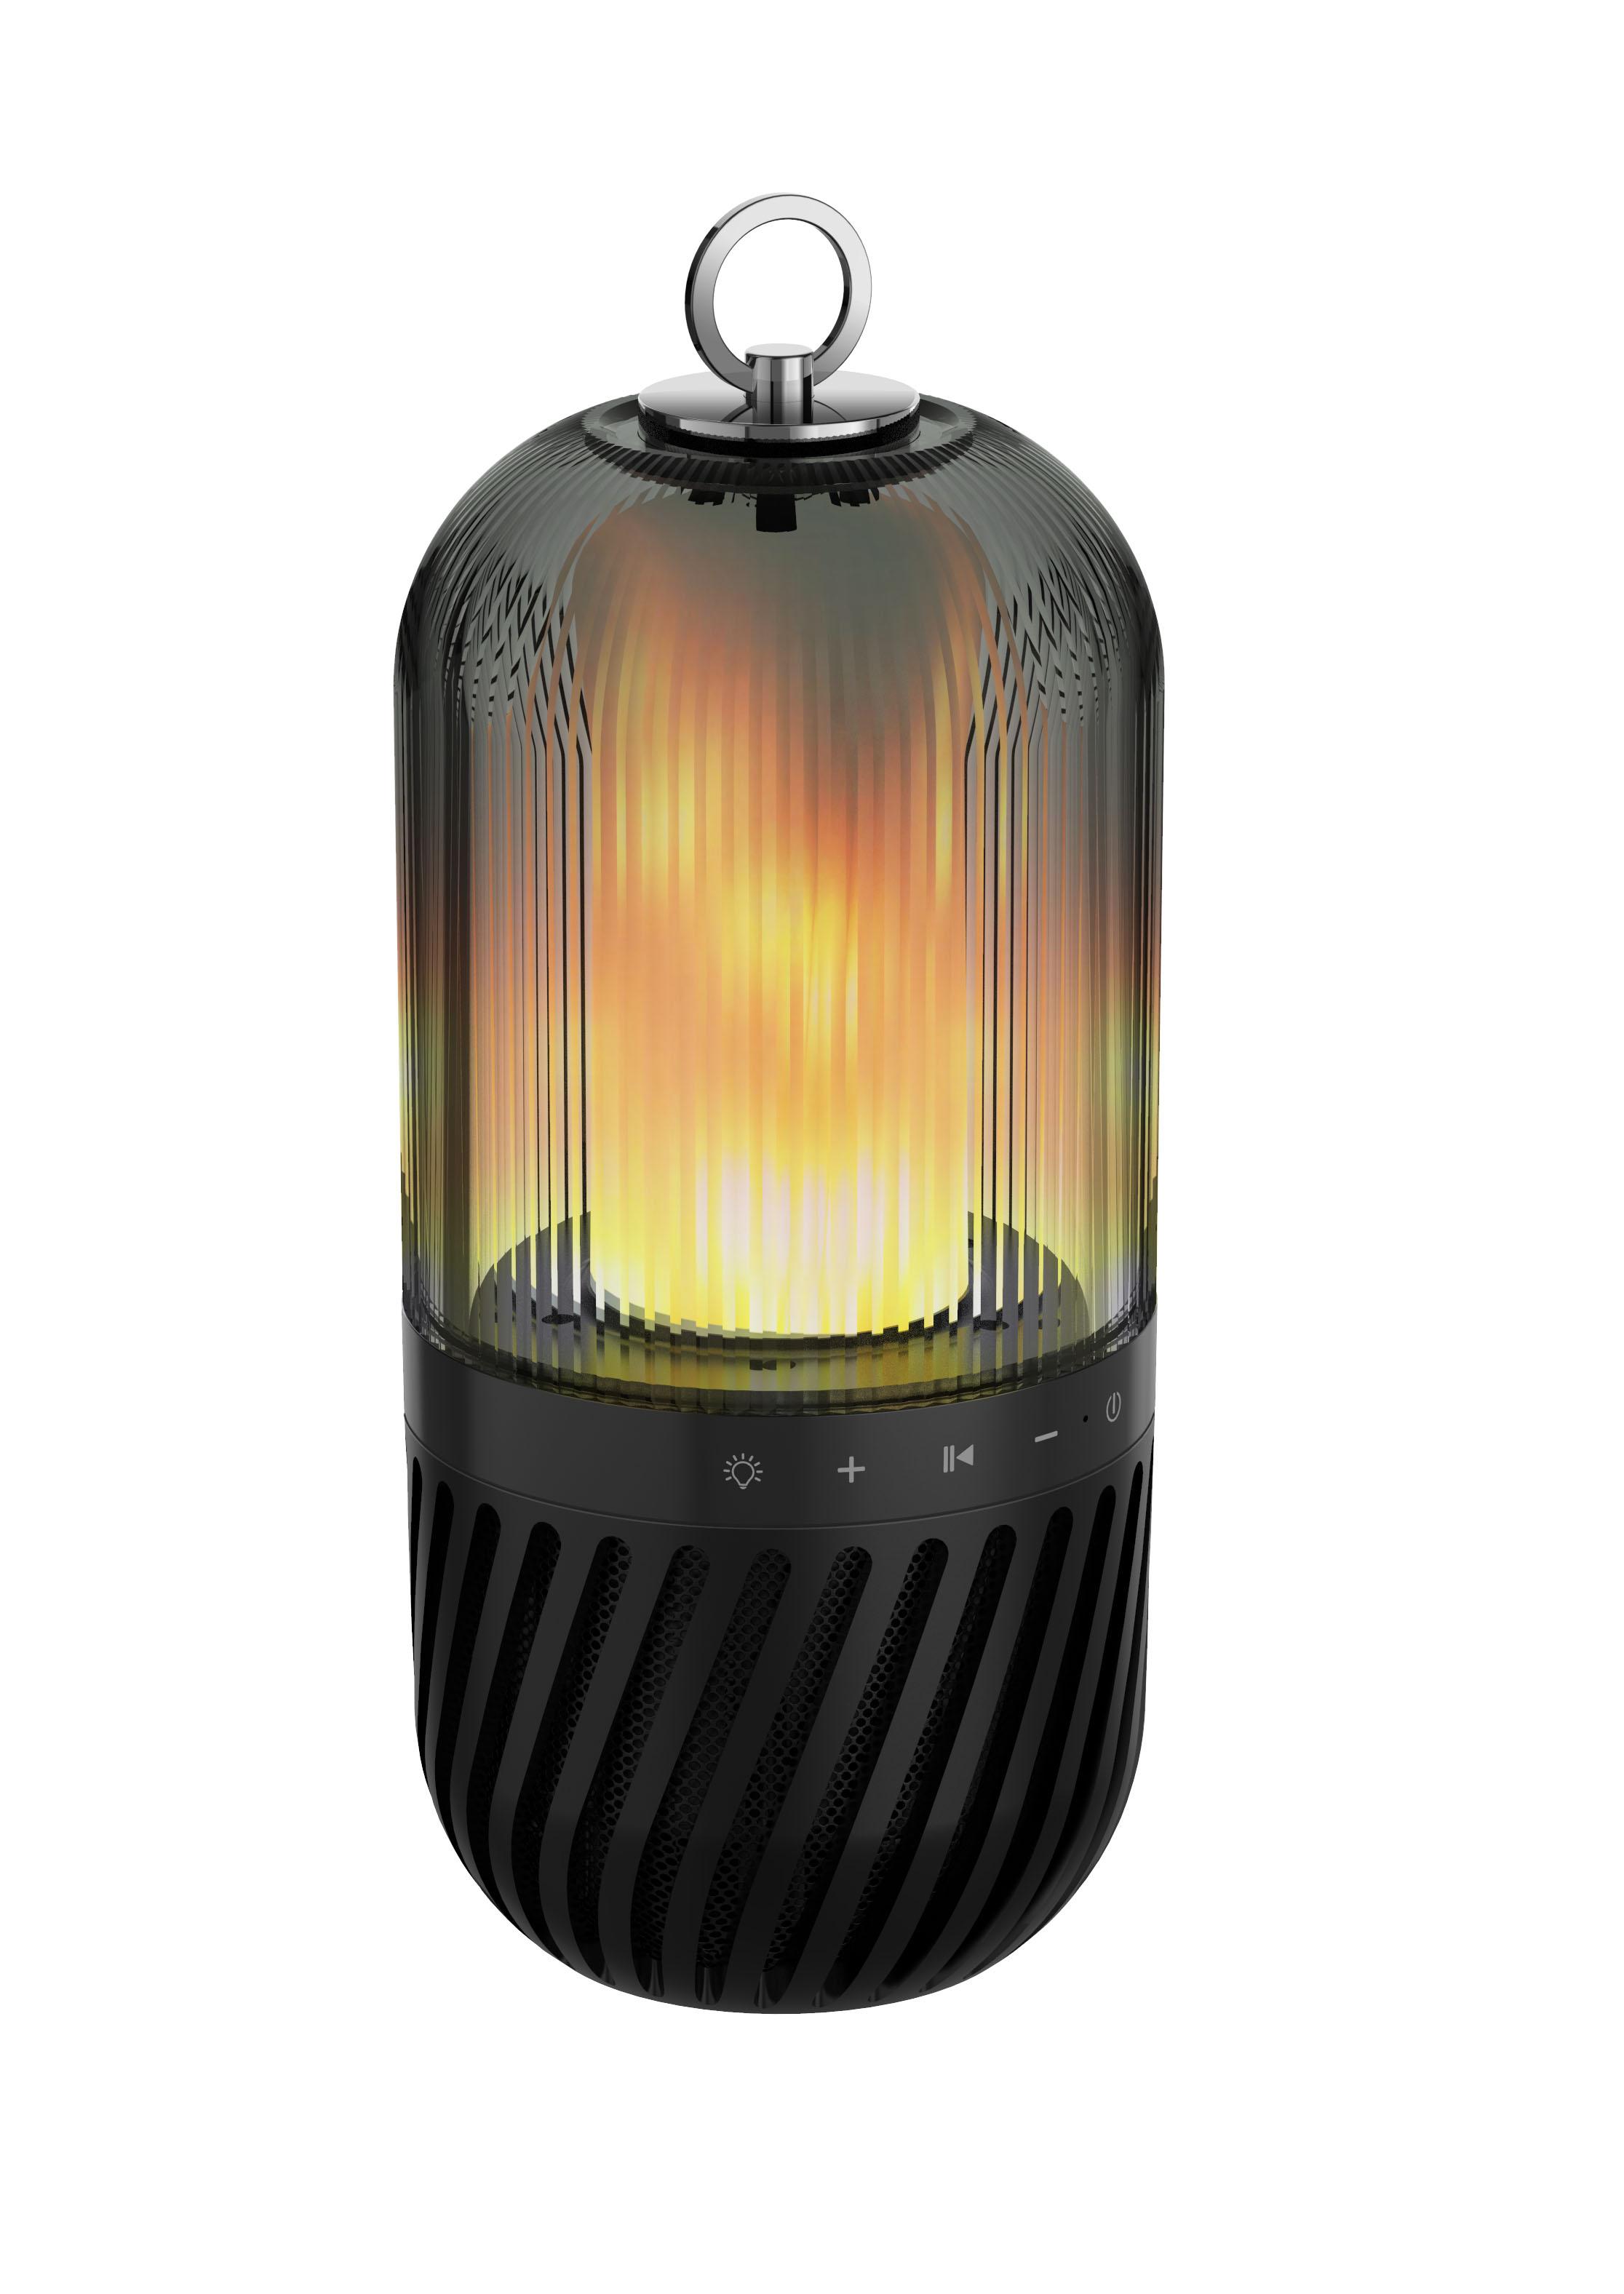 L05S RP 灯 LED 荣事达火焰氛围蓝牙音箱锂电池